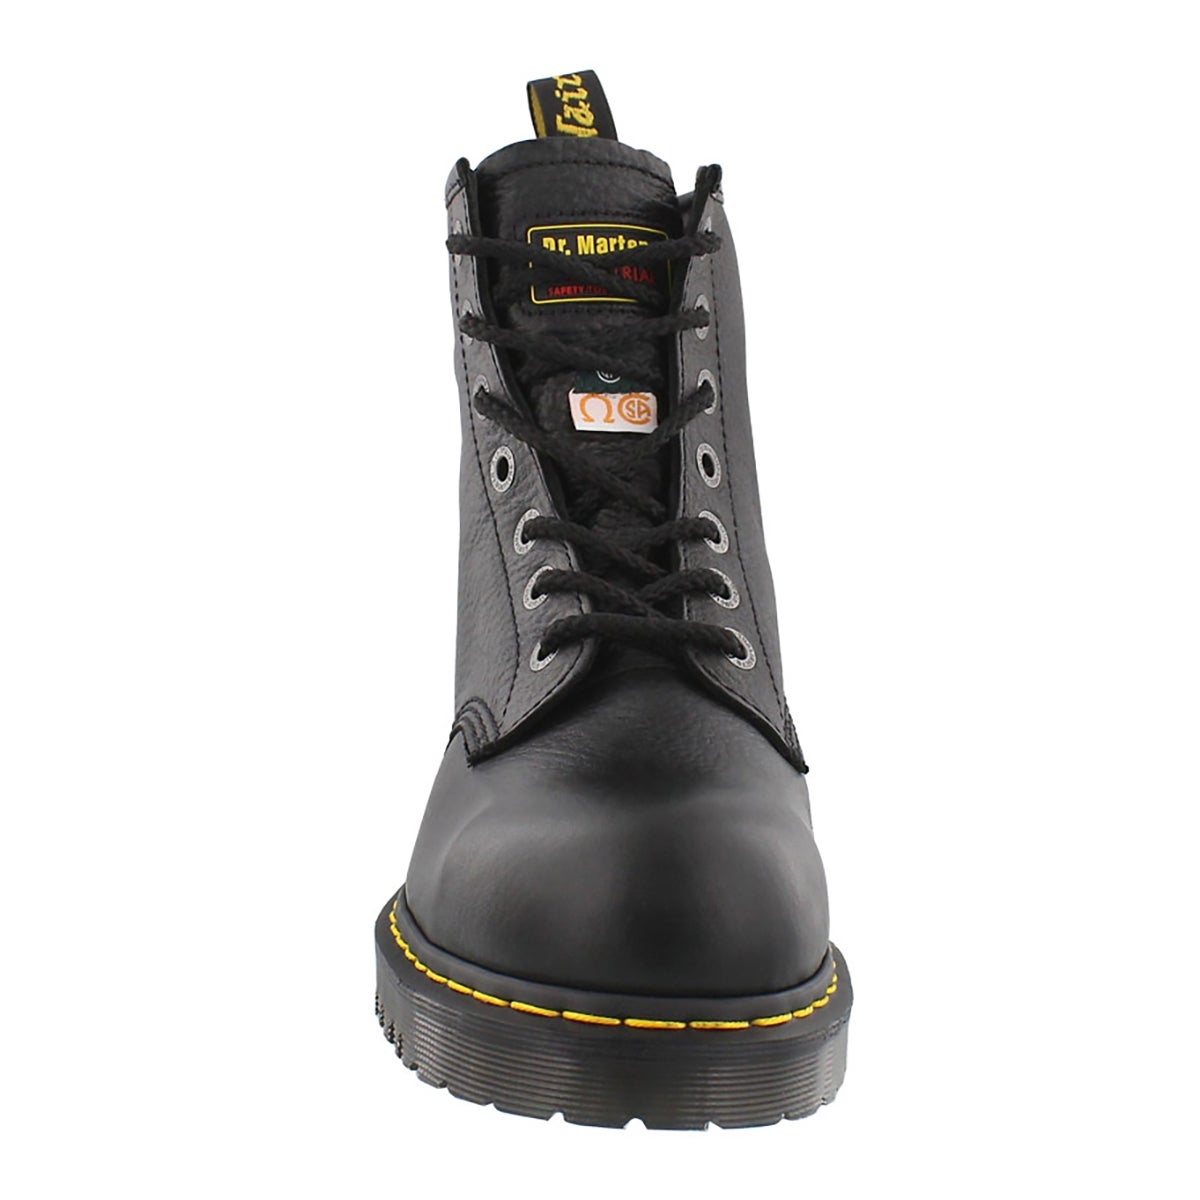 Mns Icon 7B10 ST black CSA safety boot